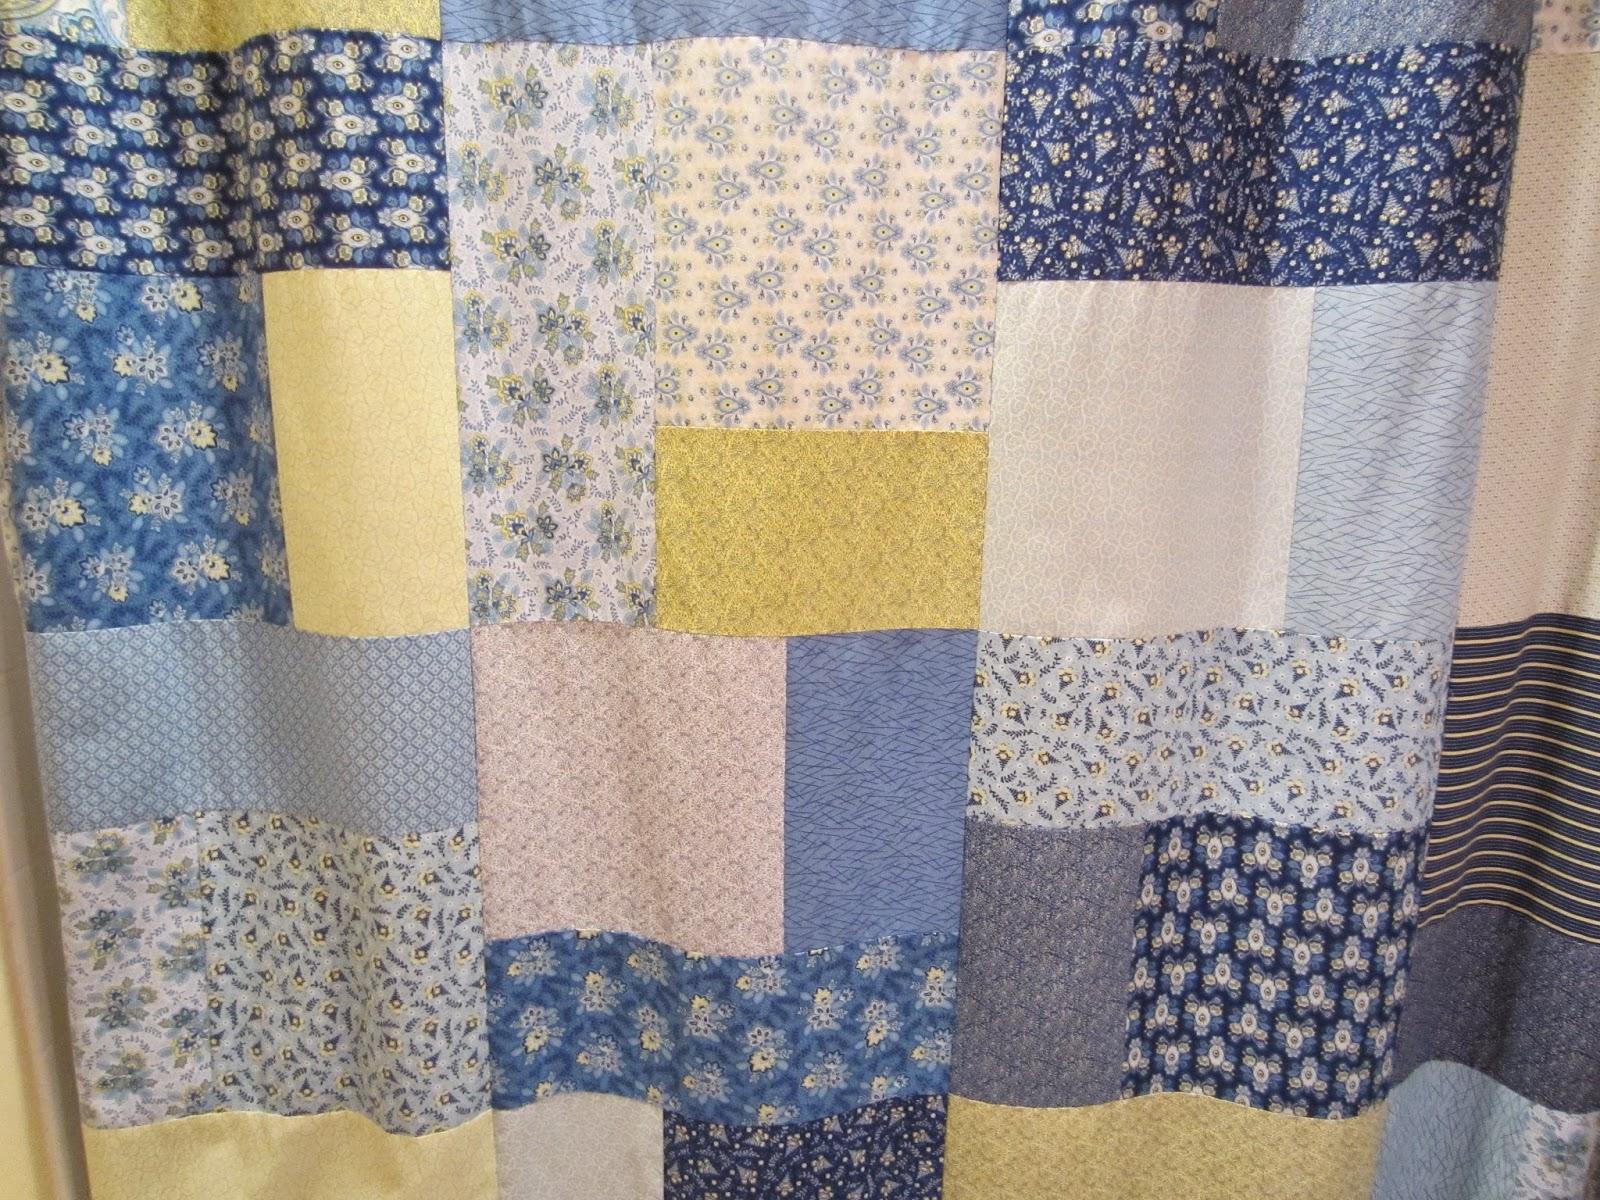 Shower curtain quilt pattern - Shower Curtain Quilt Pattern 0